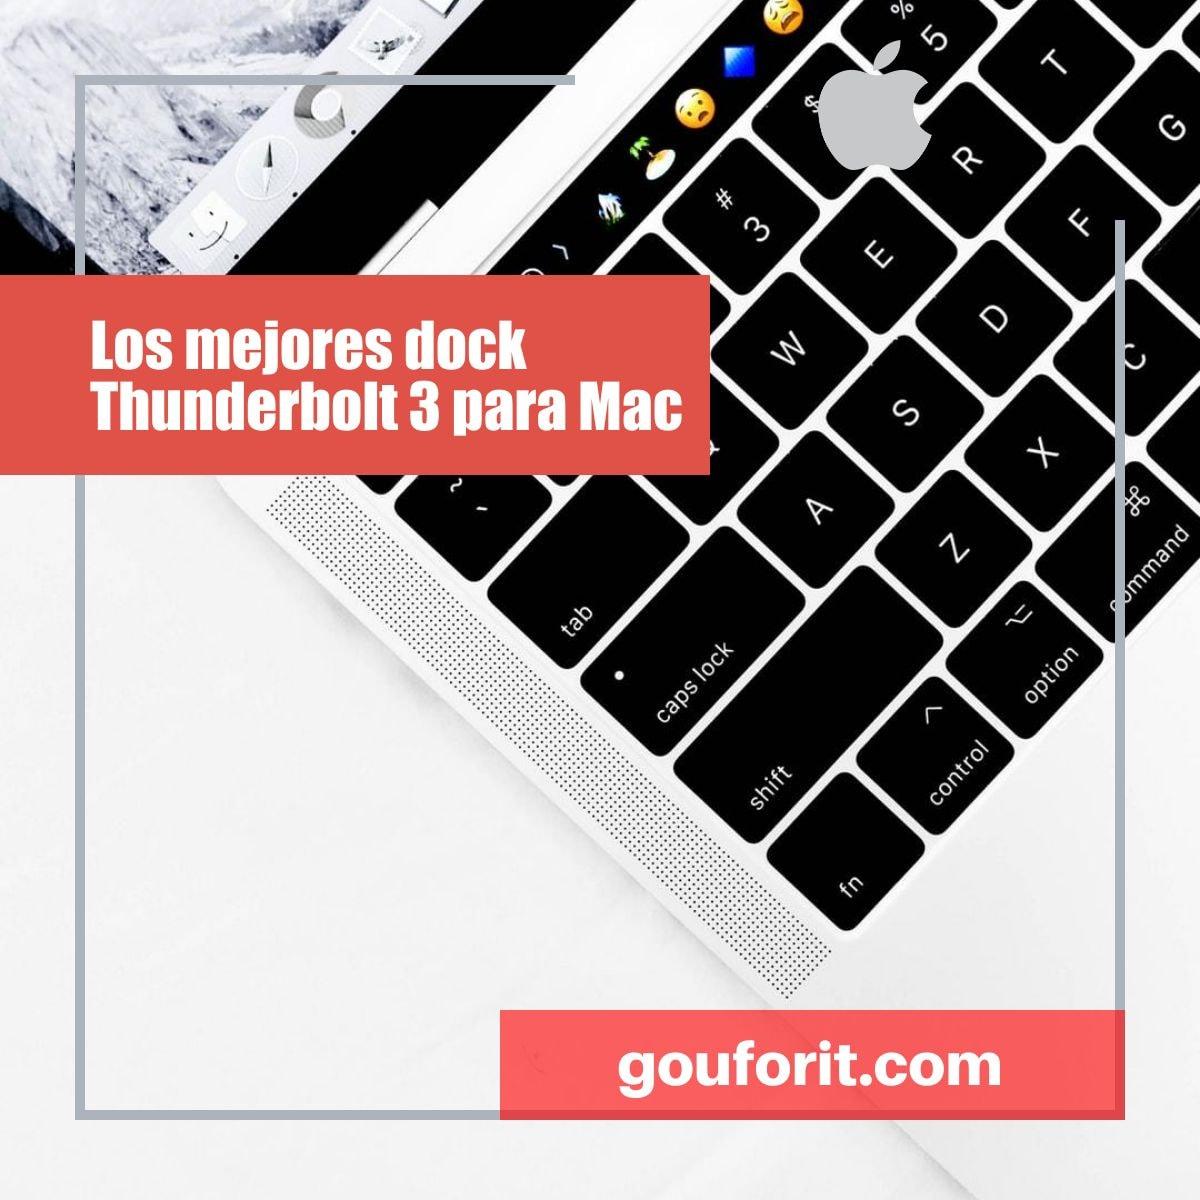 Los mejores dock Thunderbolt 3 para Mac